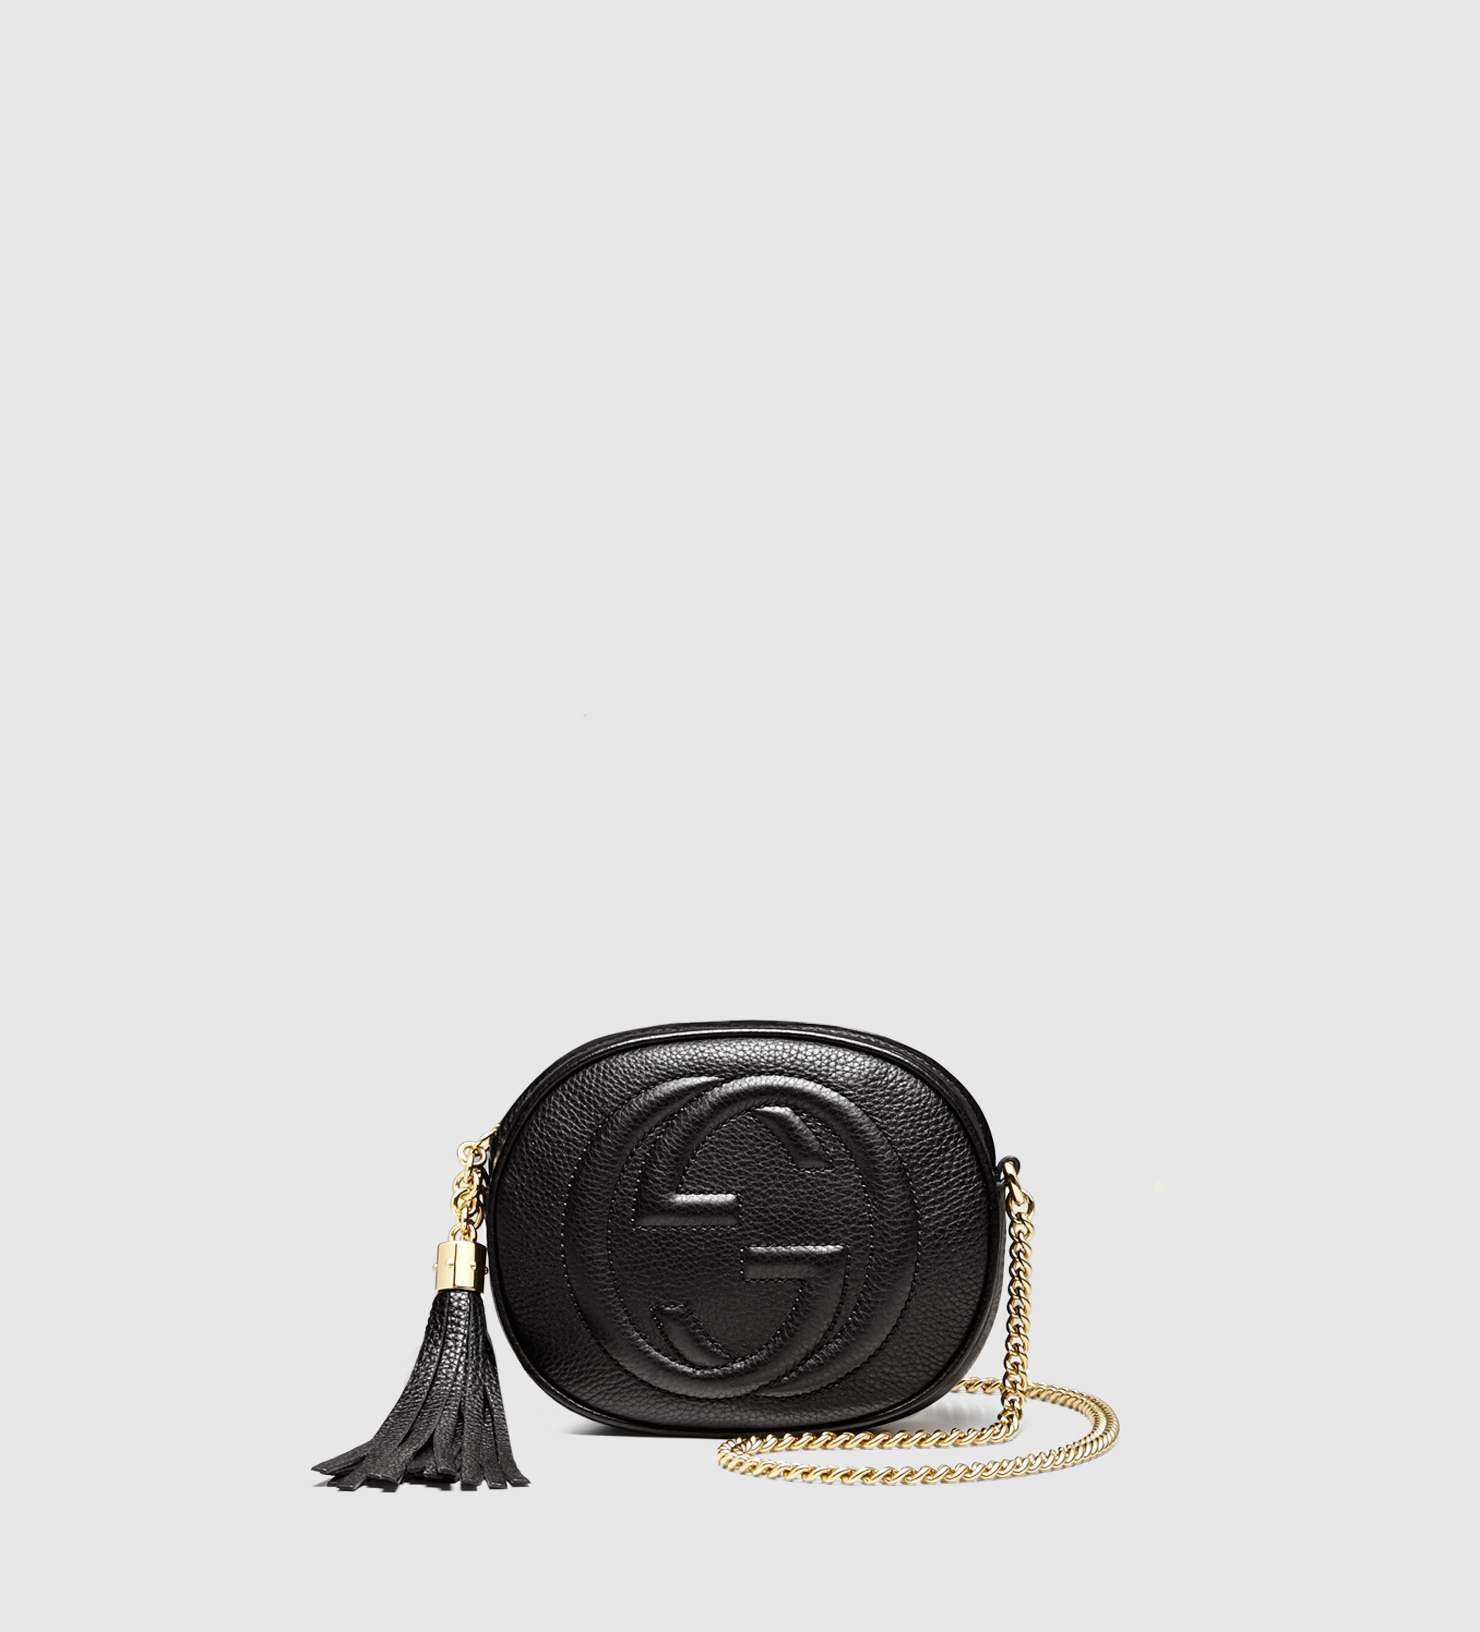 c72a2d7e64a7 Gucci Soho Leather Mini Chain Bag in Black - Lyst